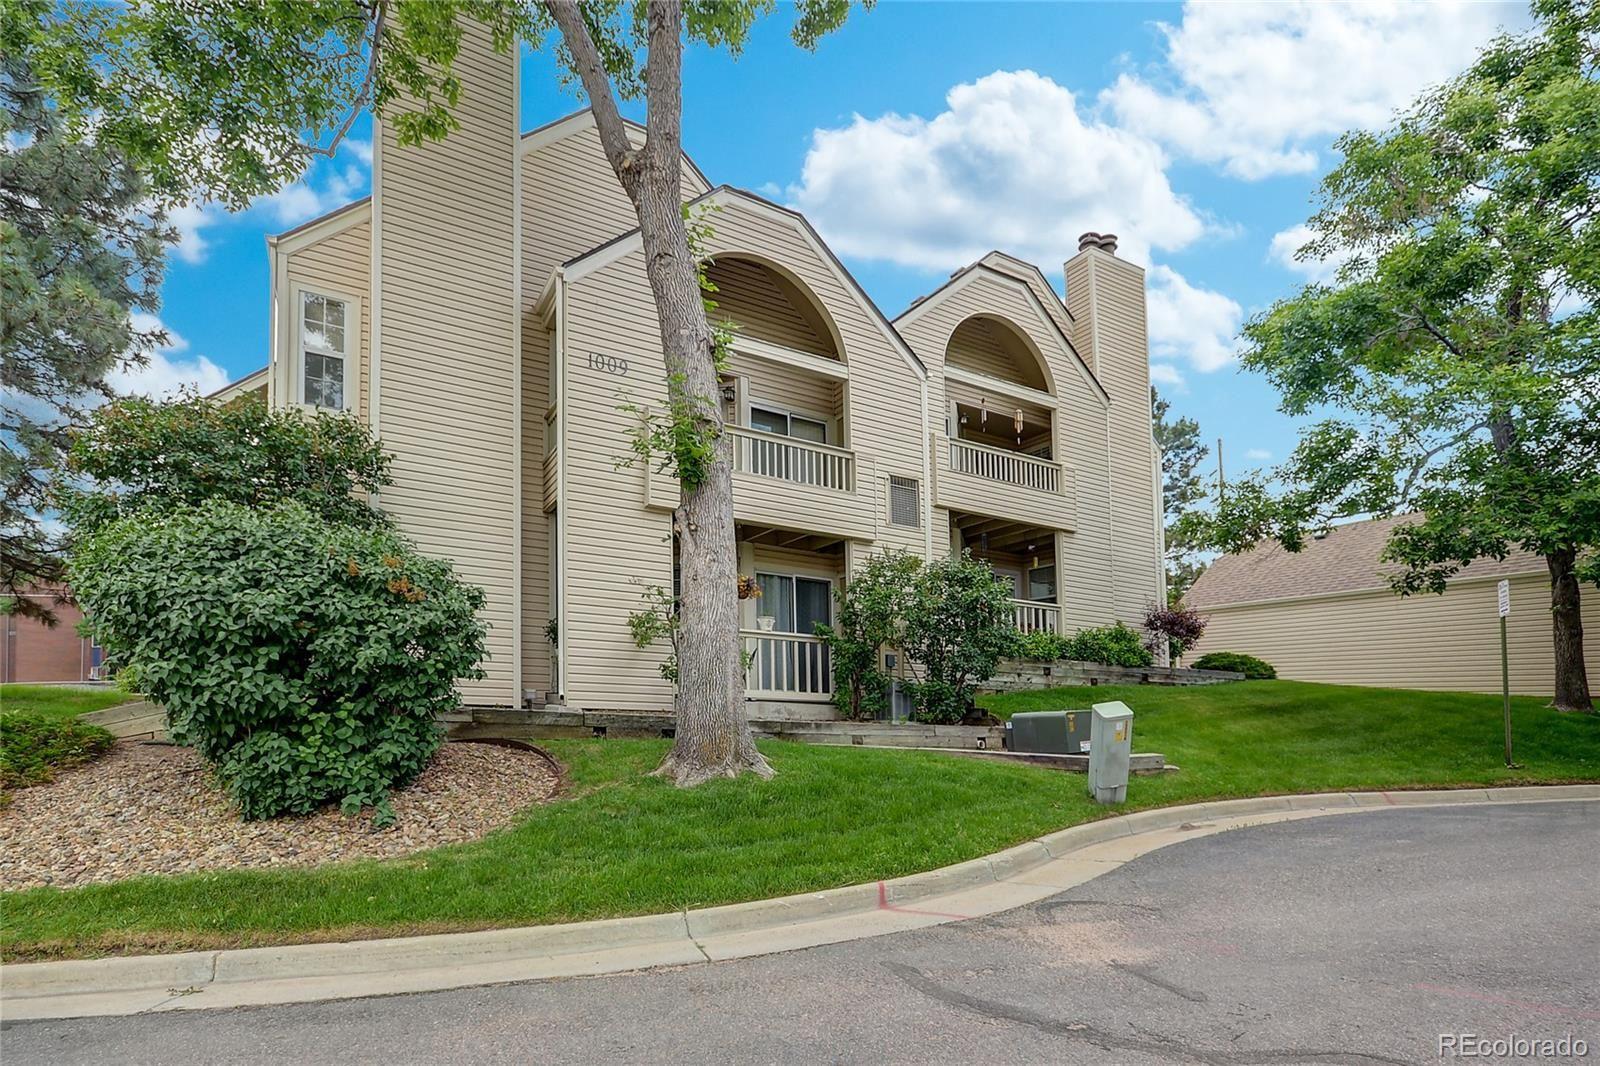 1009 S Miller Street #202, Lakewood, CO 80226 - #: 7034350